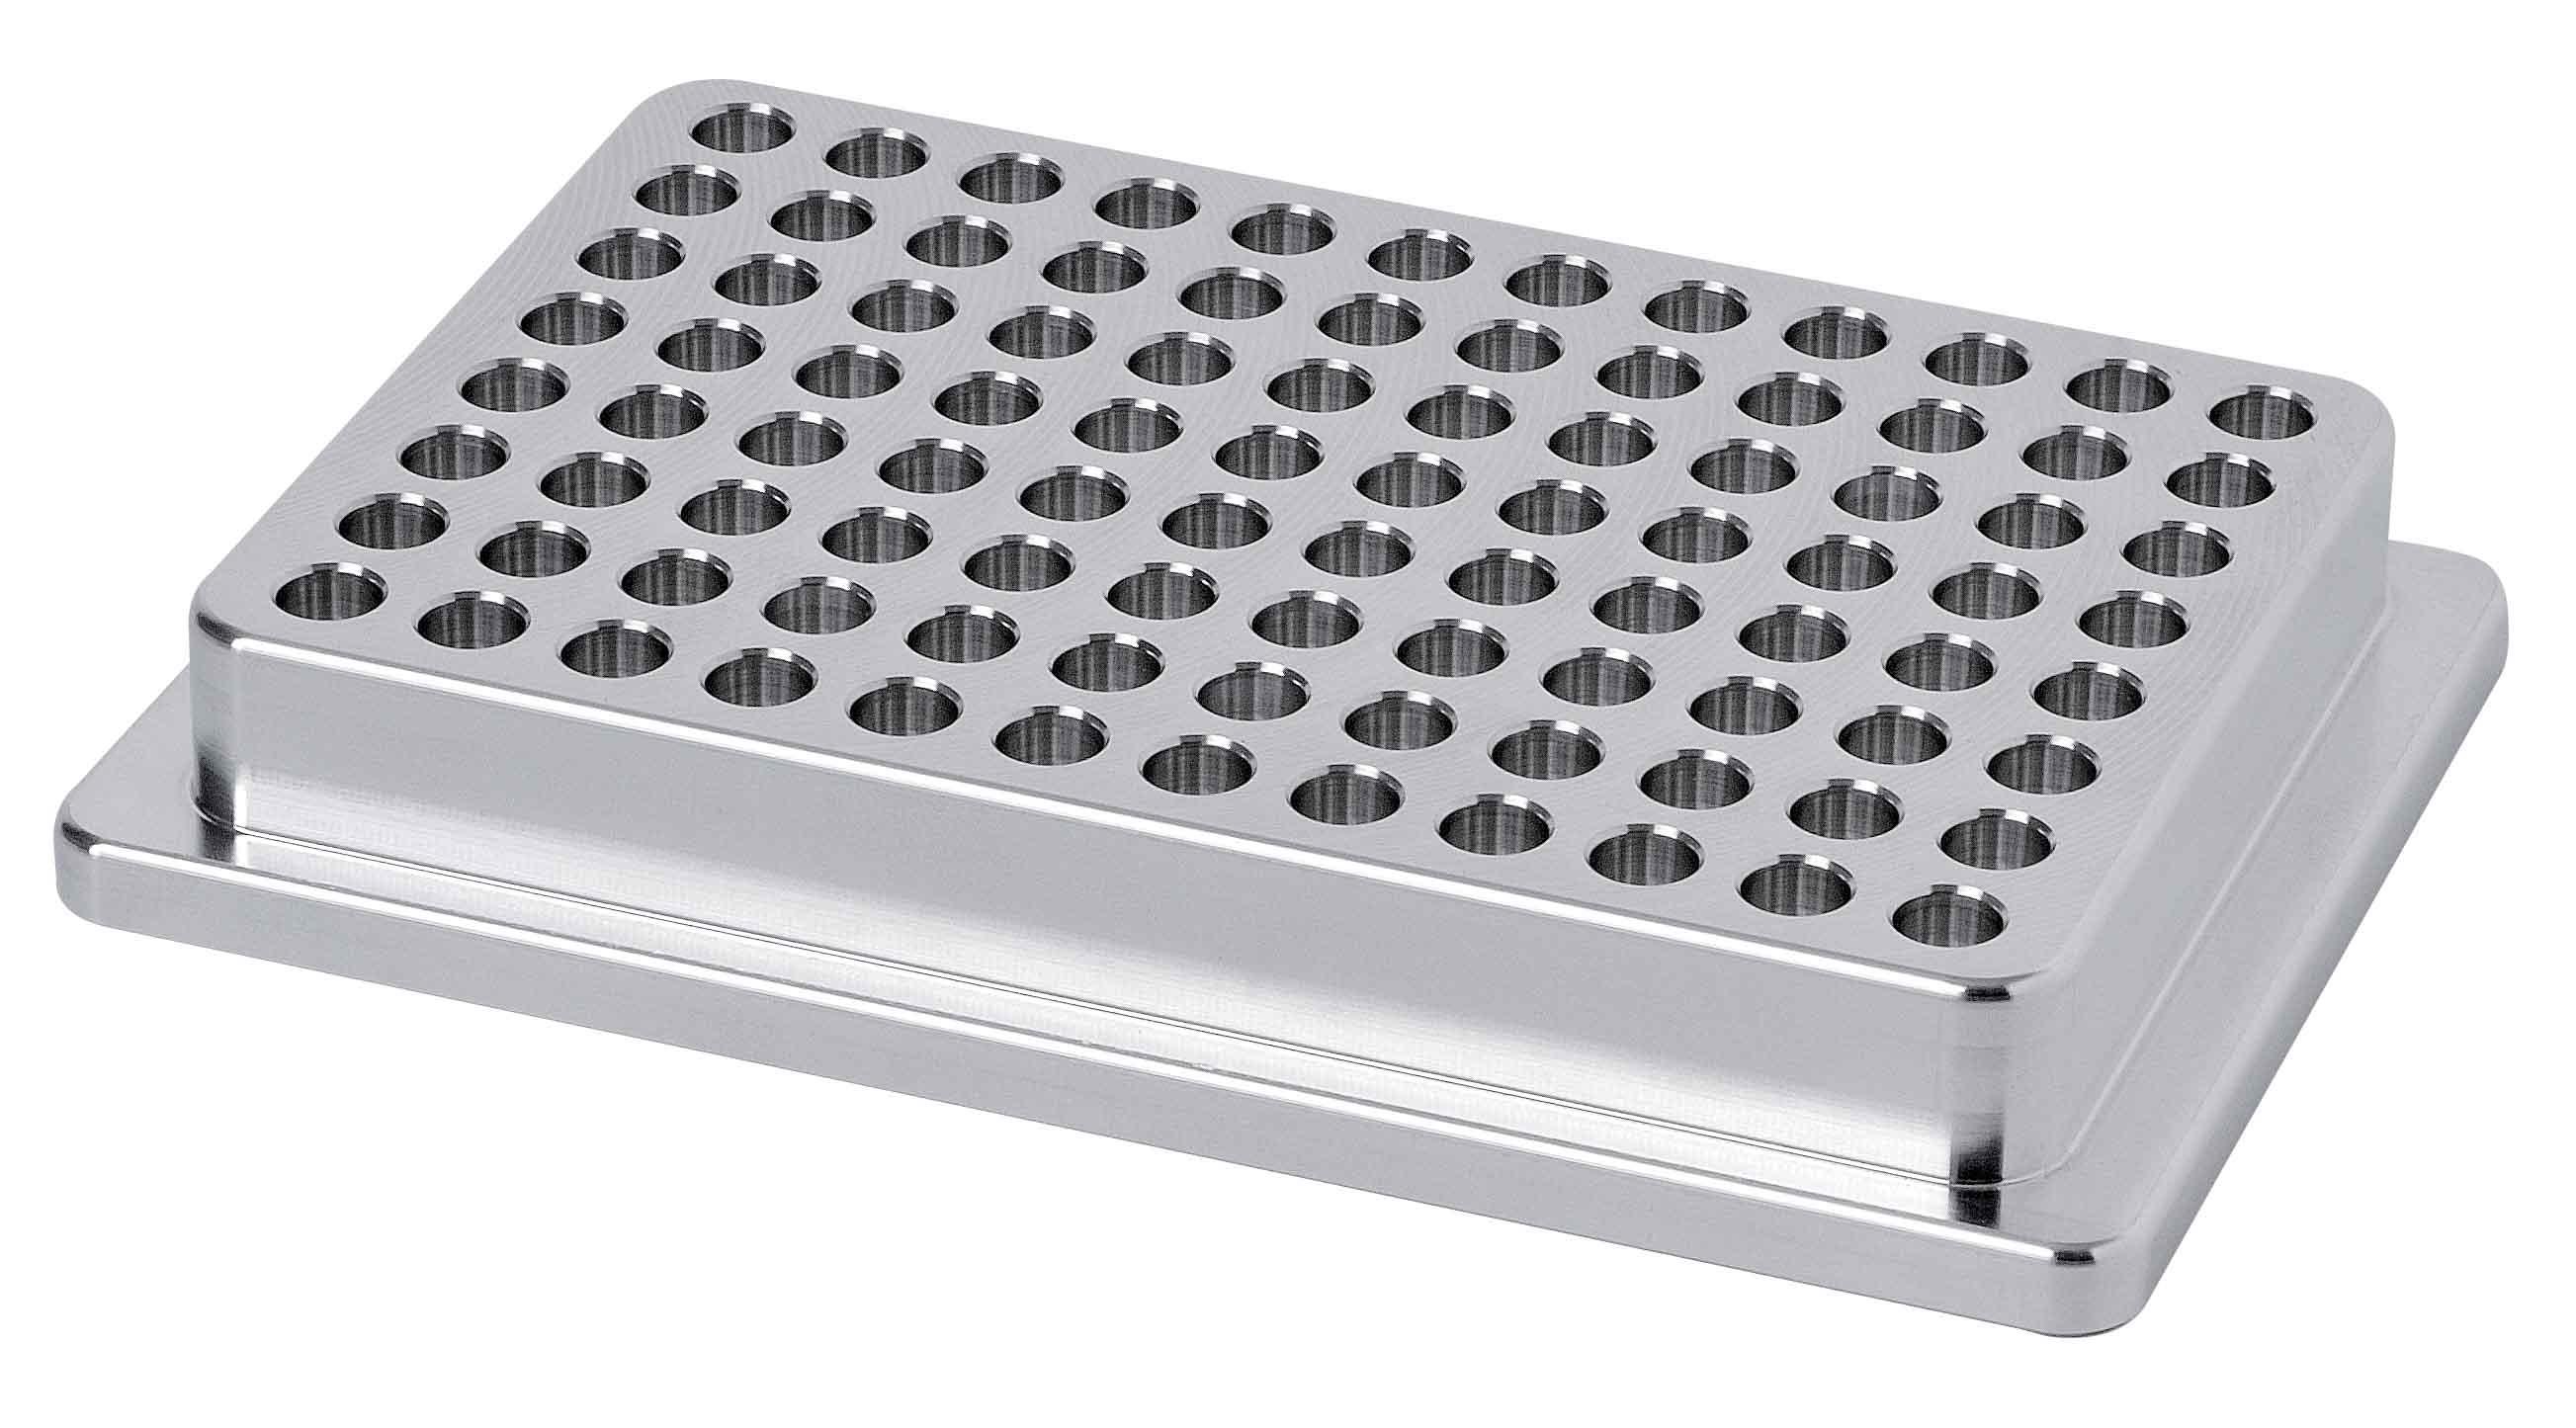 F1077604_MAIN_Alu-heater-Block-for-PLATEMASTER-96x0-2mL.jpg